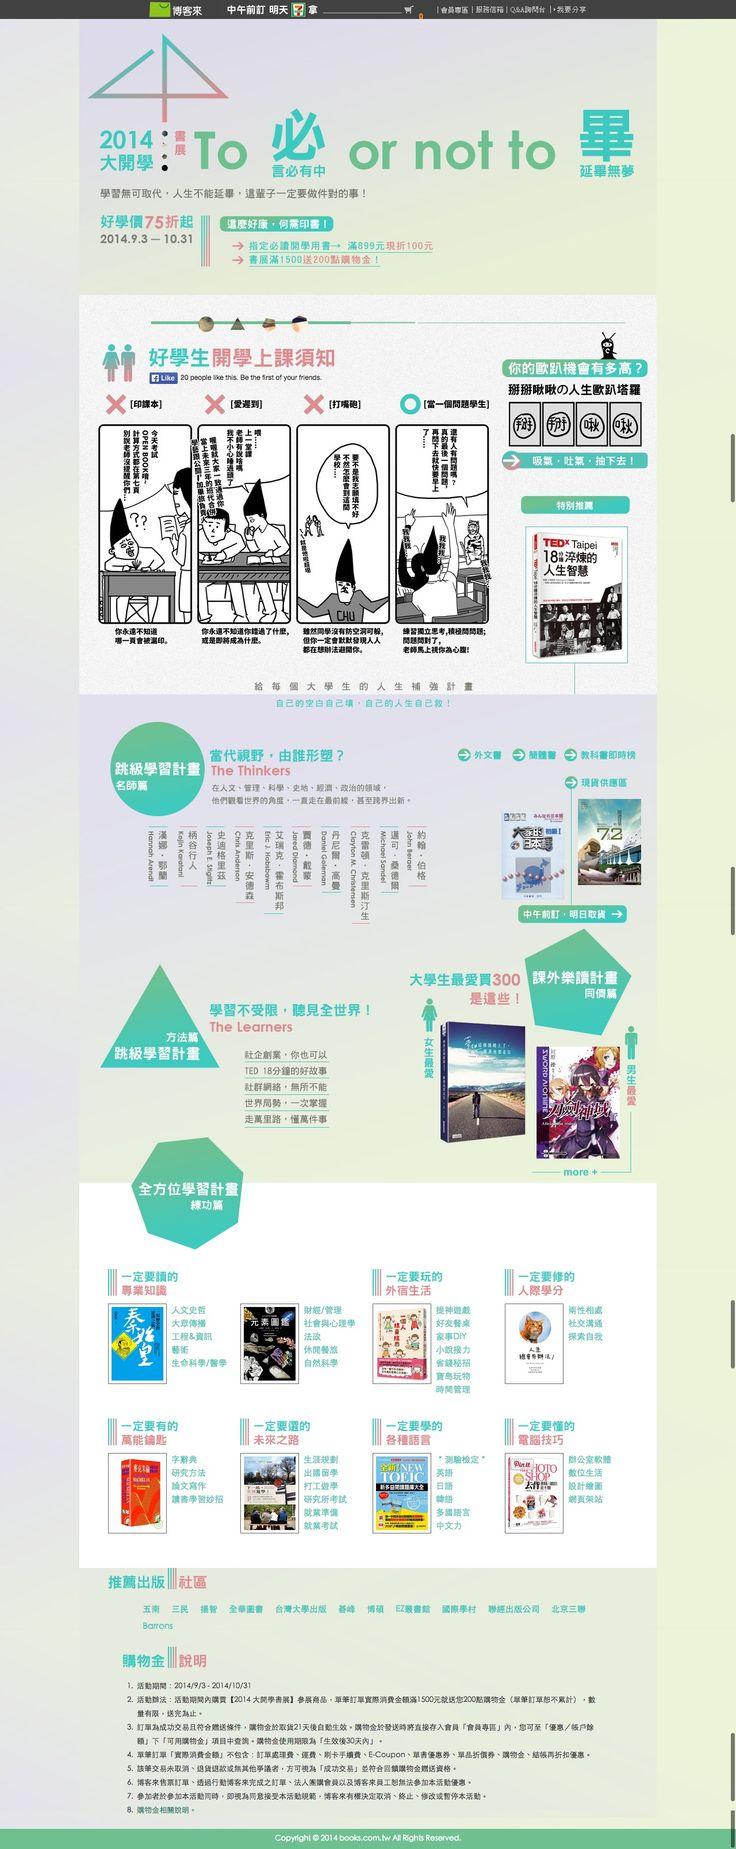 博客來2014大開學書展-2014/9/3-2014/10/31-好學75折起 | http://www.books.com.tw/activity/2014/09/school/index.html?loc=001_001